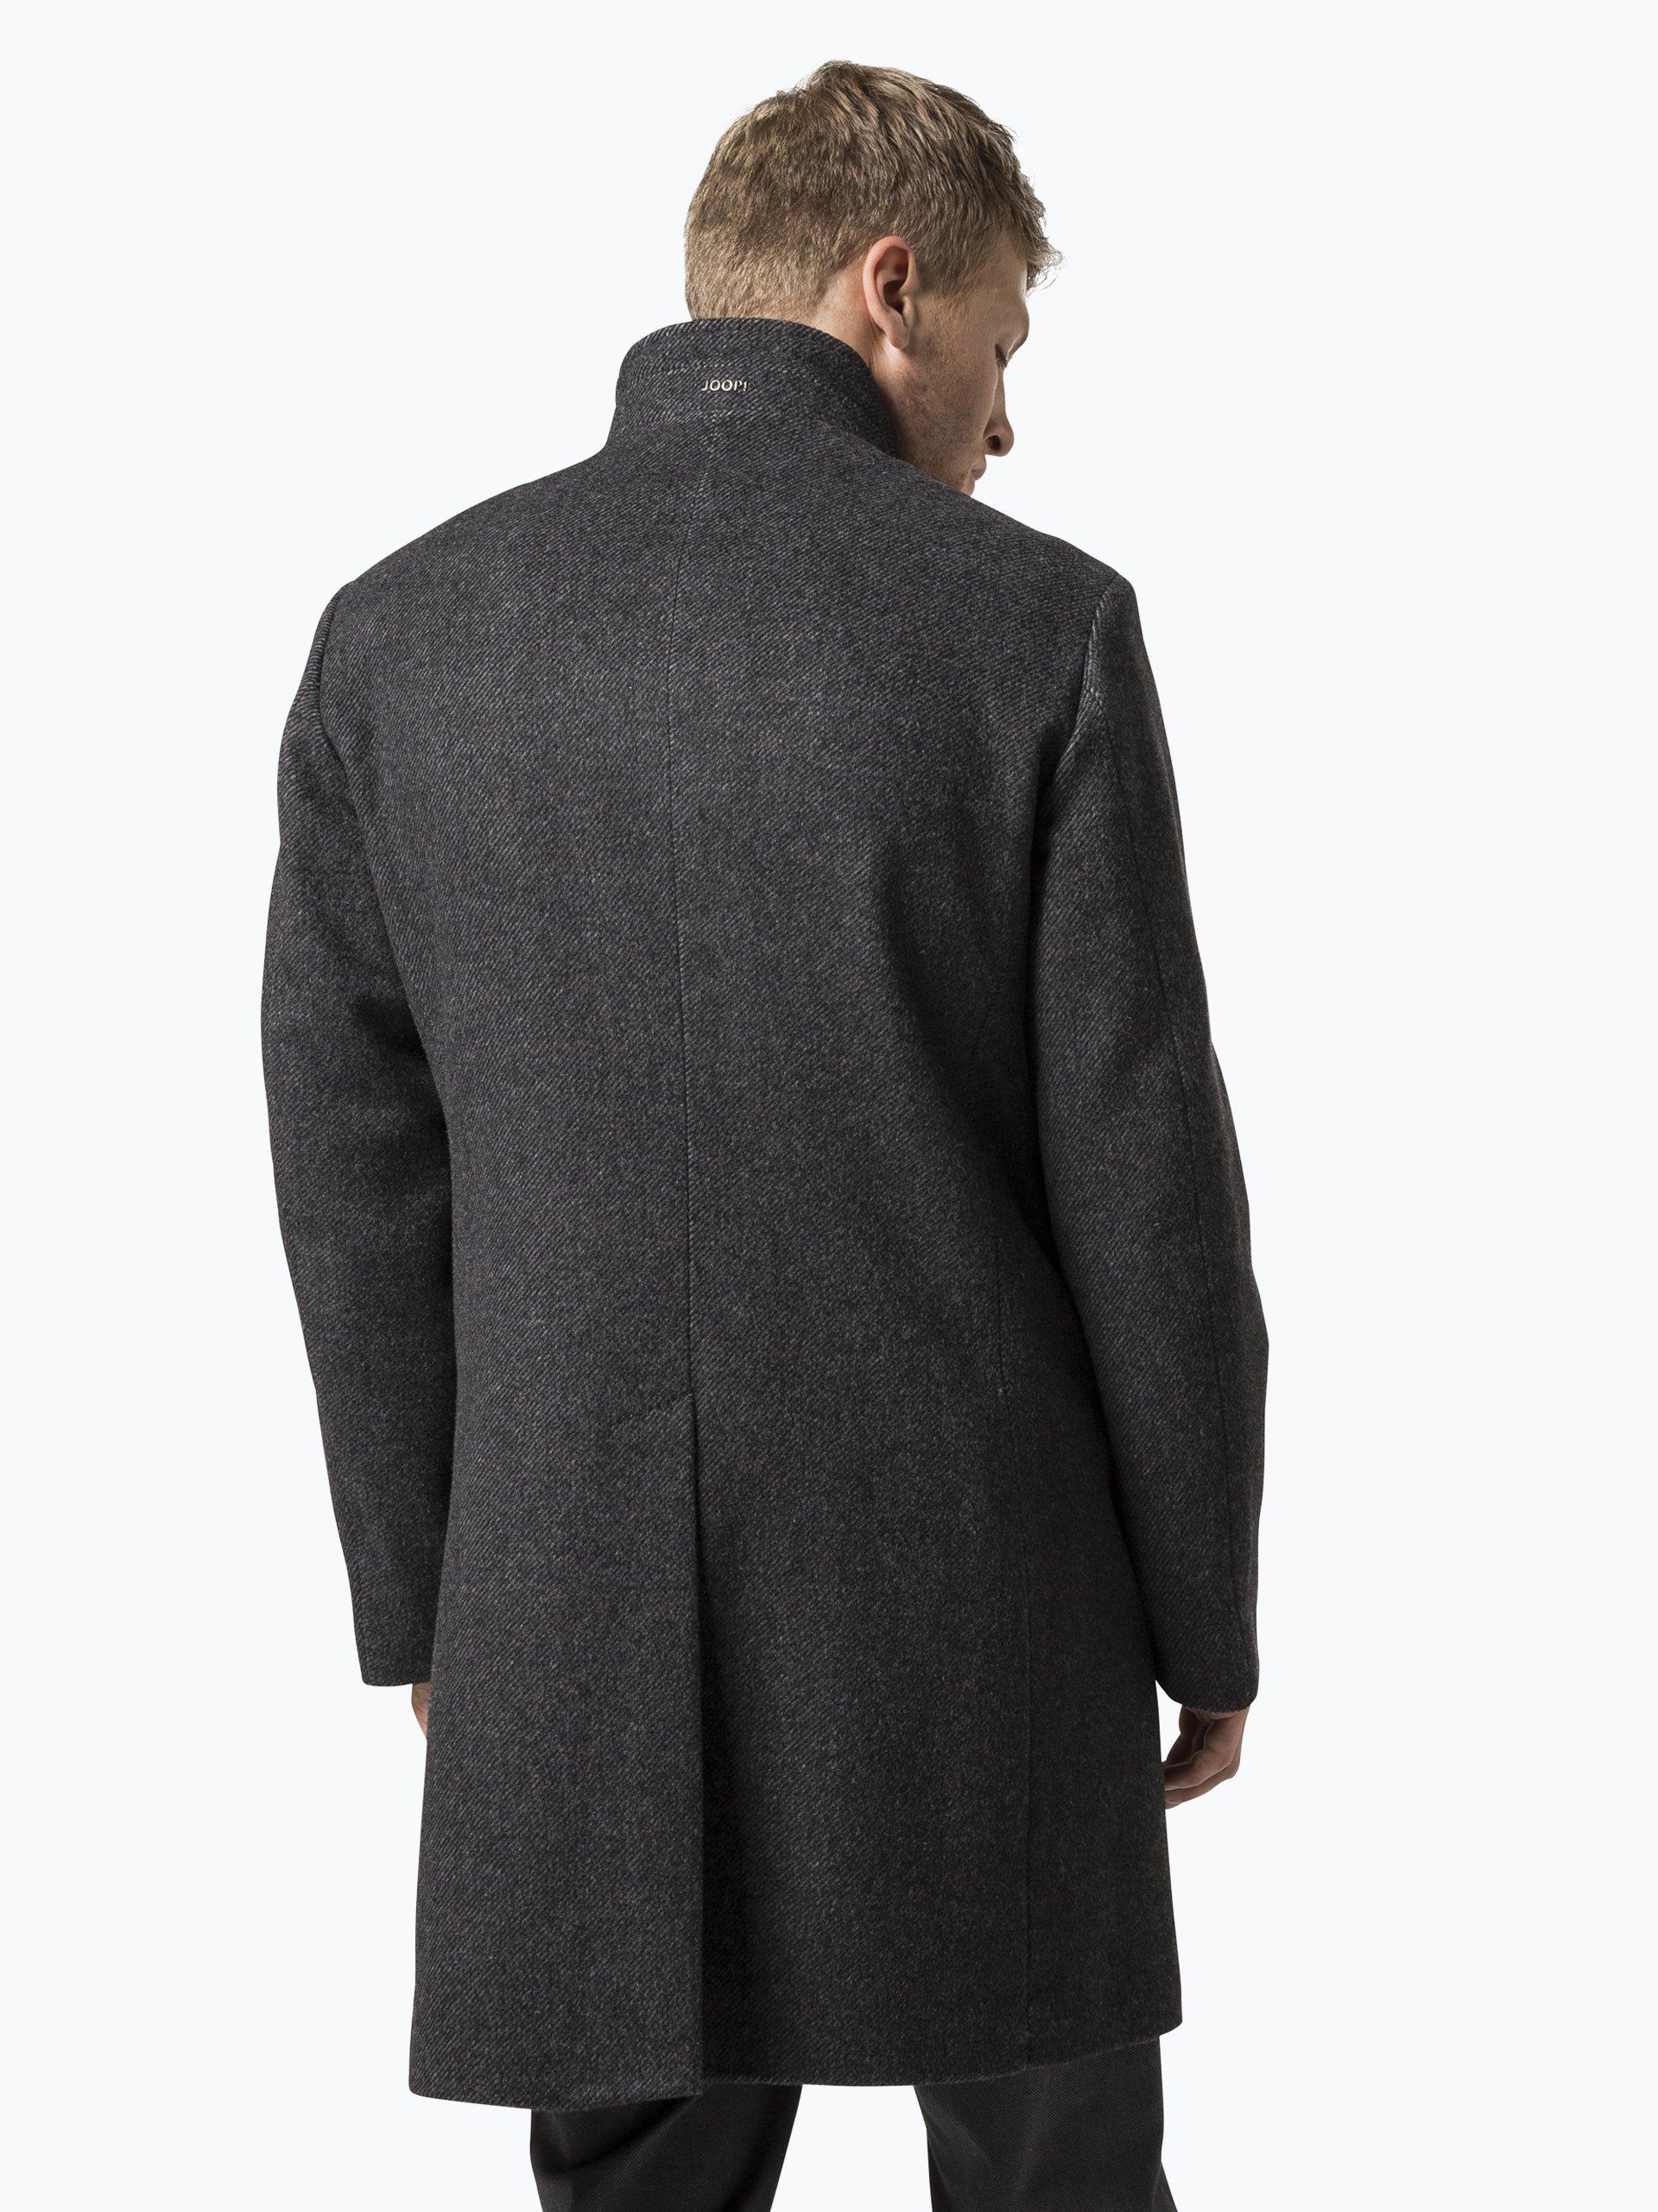 joop herren mantel maron anthrazit uni online kaufen. Black Bedroom Furniture Sets. Home Design Ideas